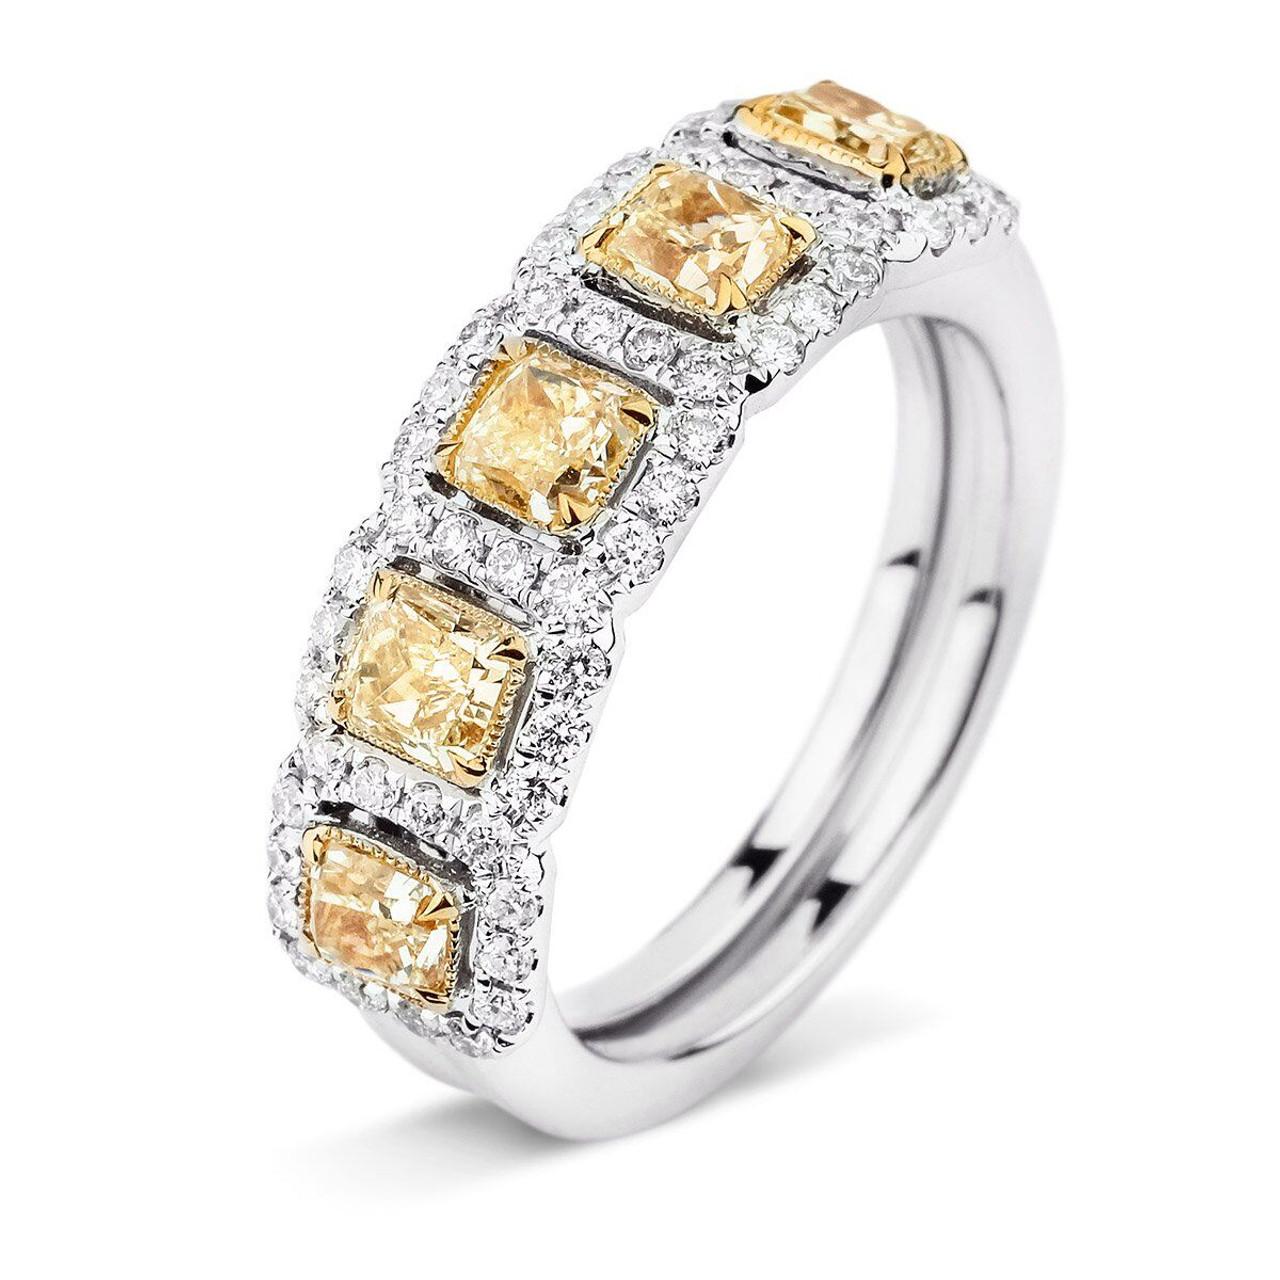 18kt White and Yellow Gold 5Stone Yellow Diamond Halo Band